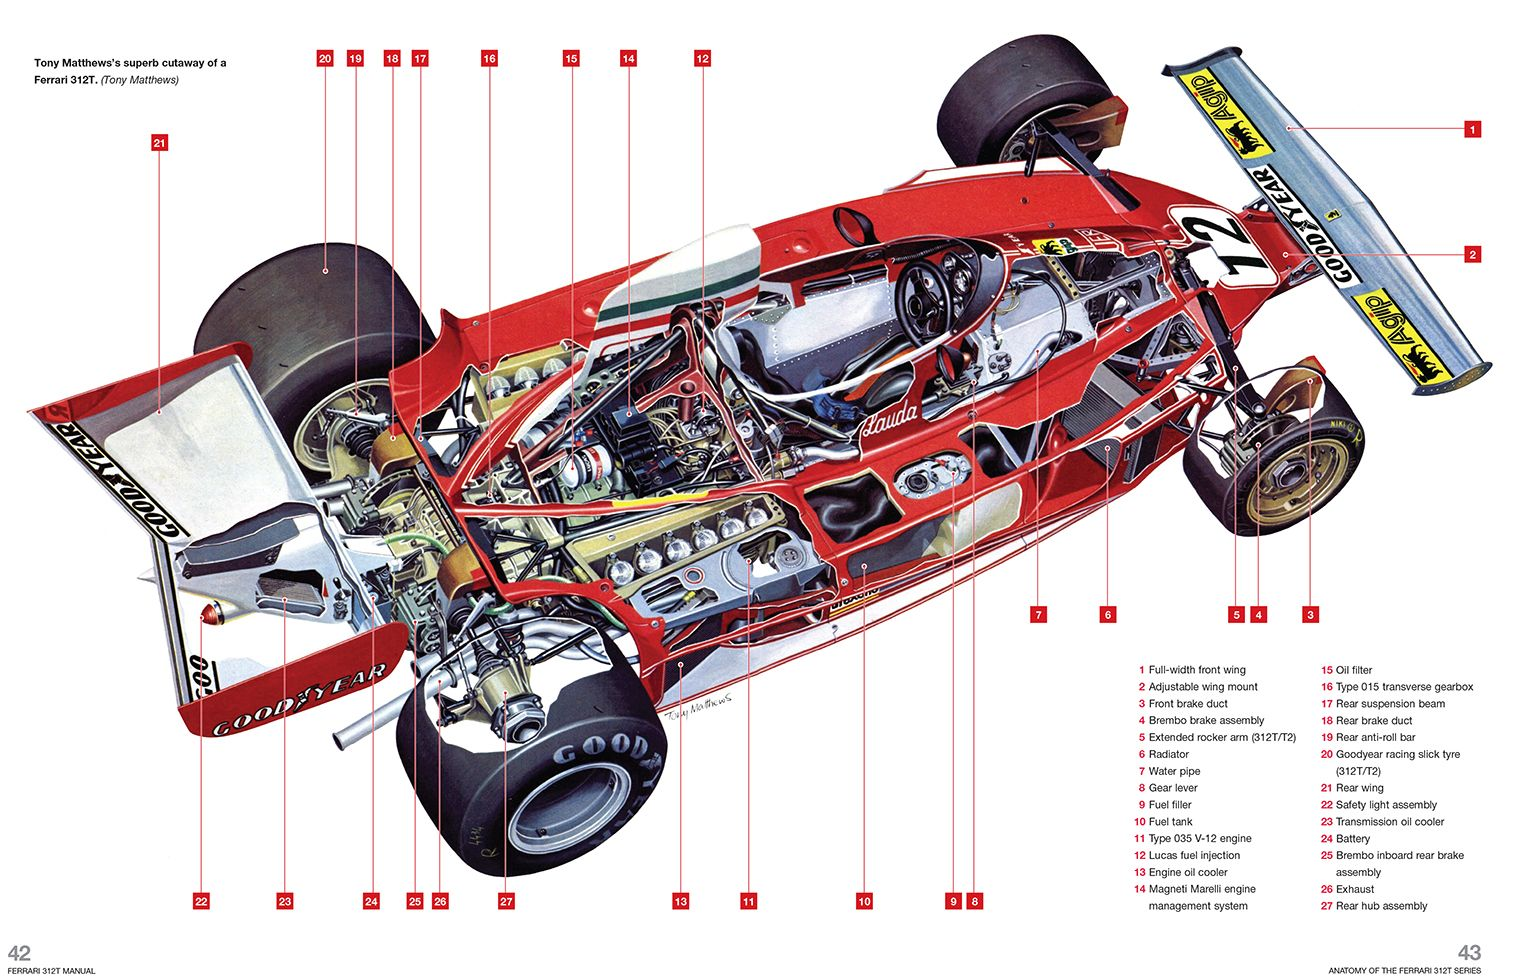 Pin By Tar Antal On Formula 1 Pinterest Cutaway F1 And Cars